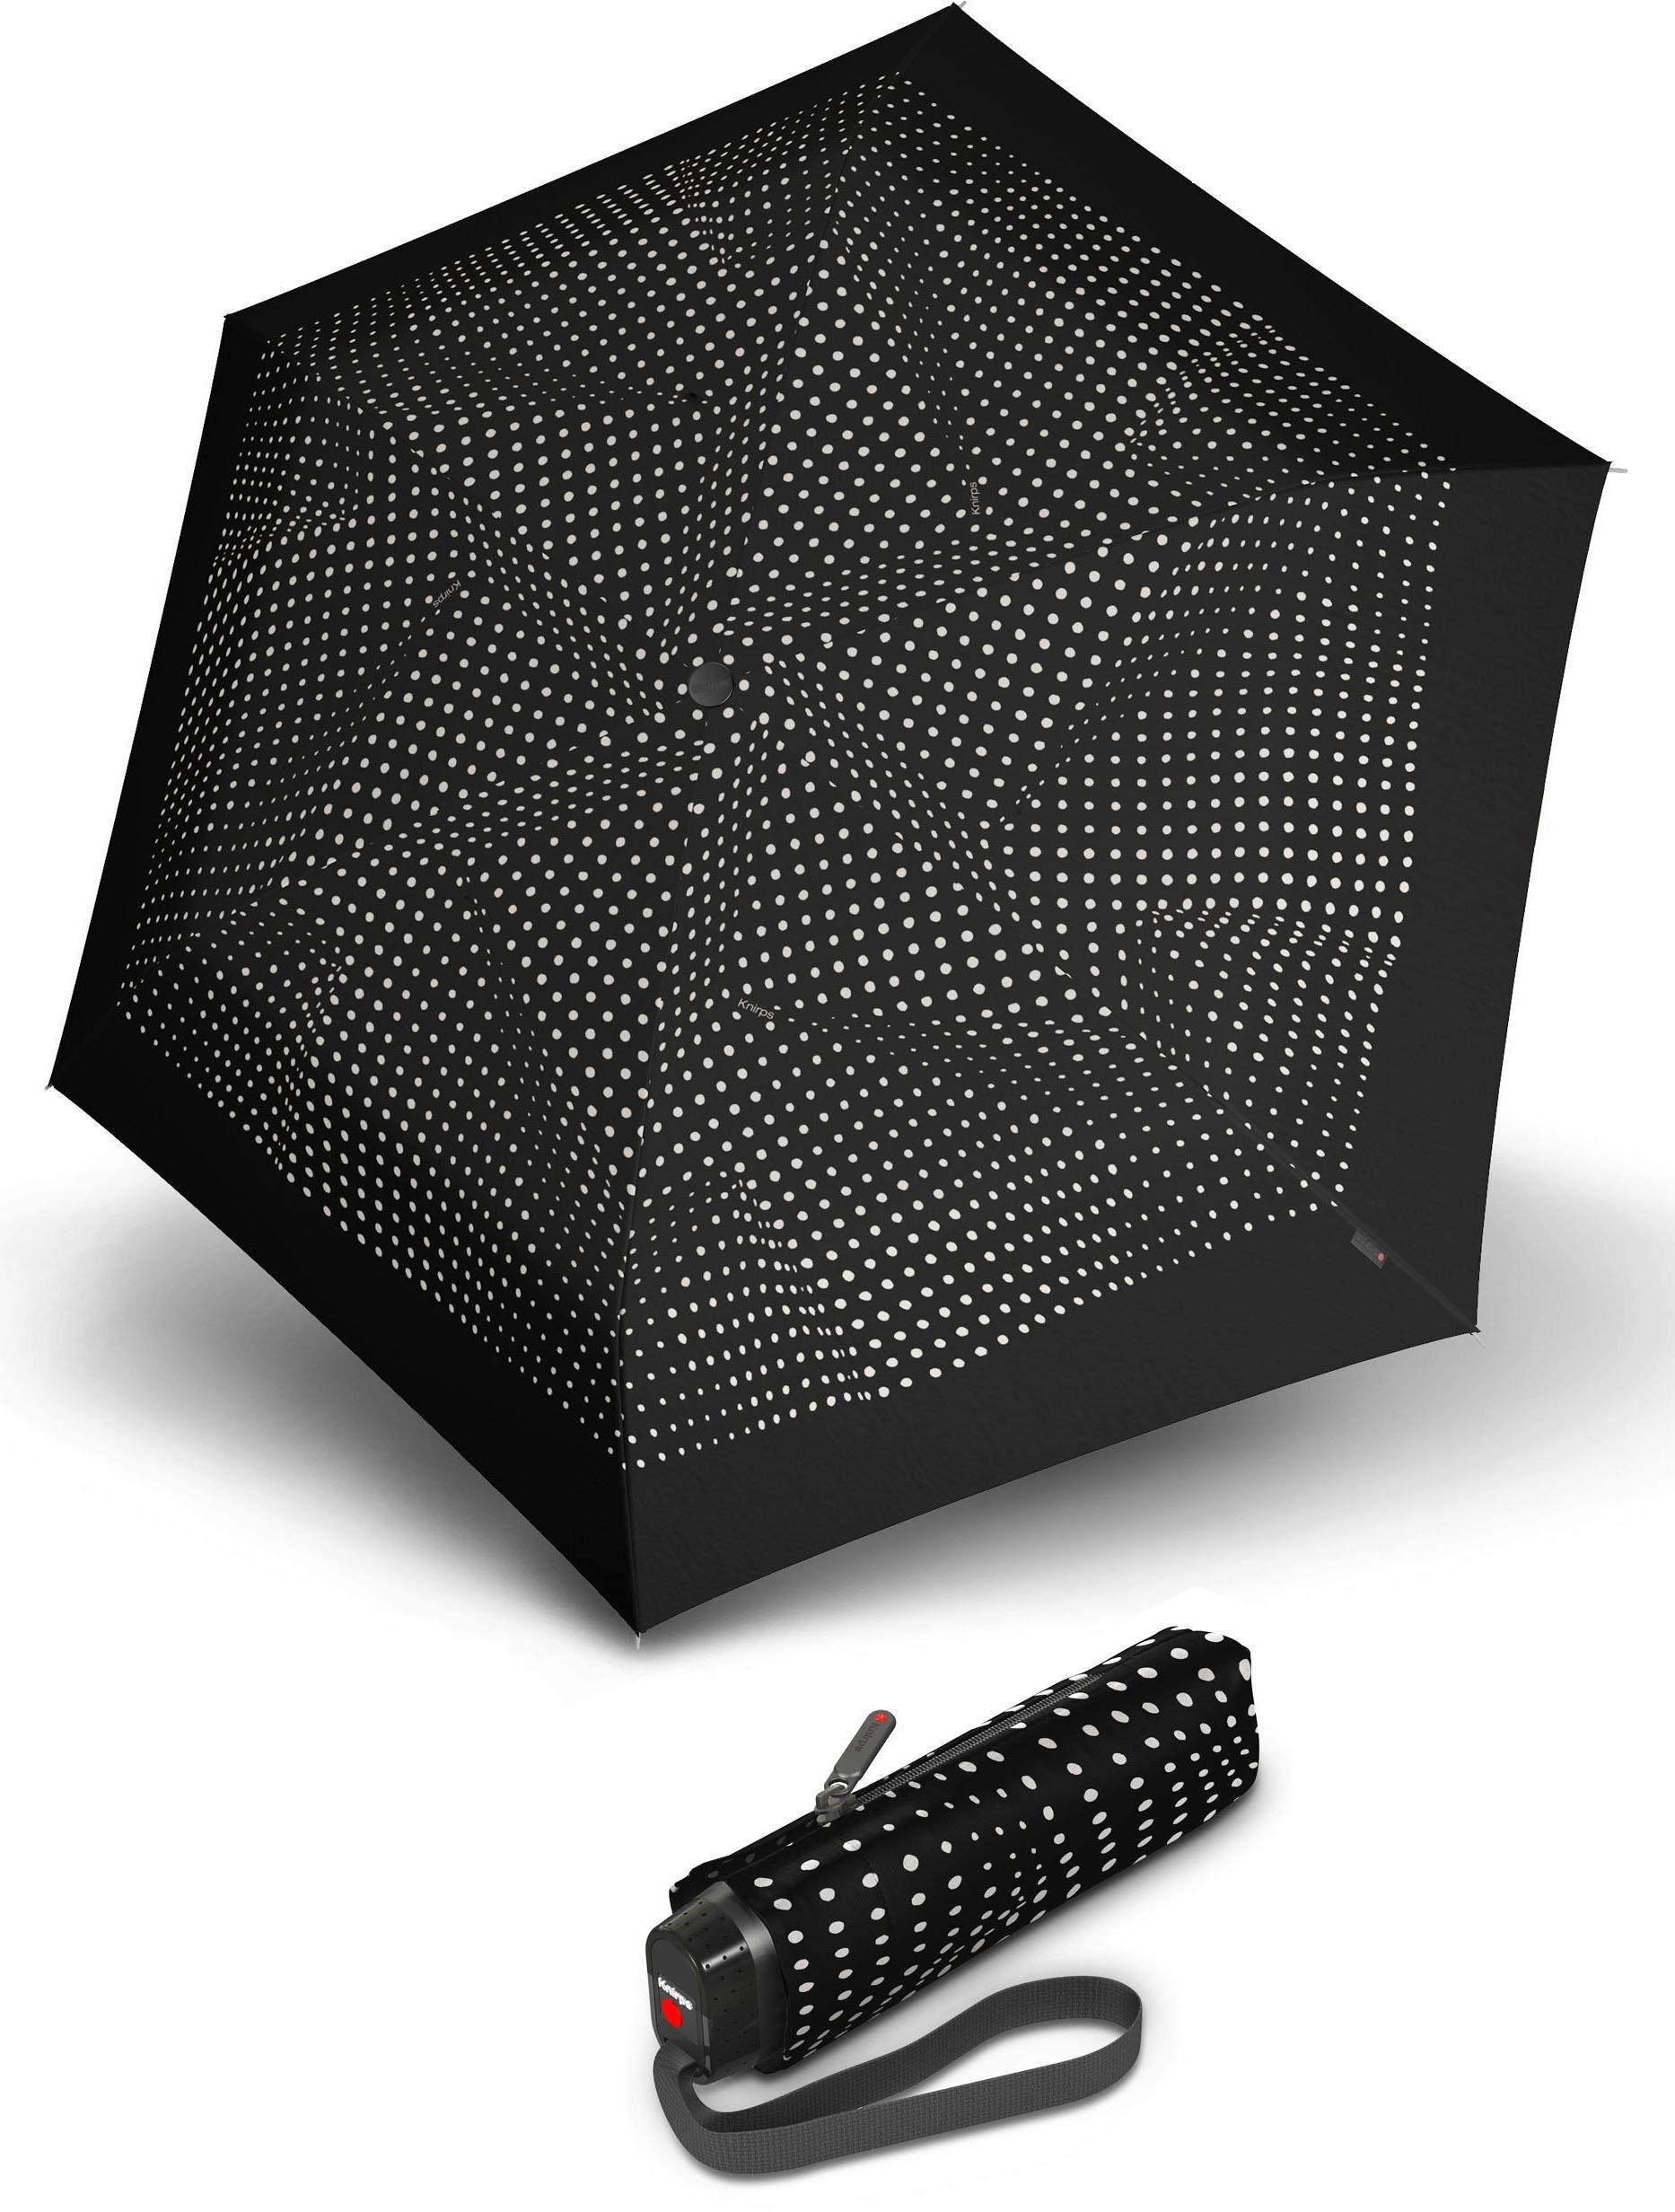 Knirps® Regenschirm - Taschenschirm, »TS.010 Slim Small Manual bolero black/ecru«